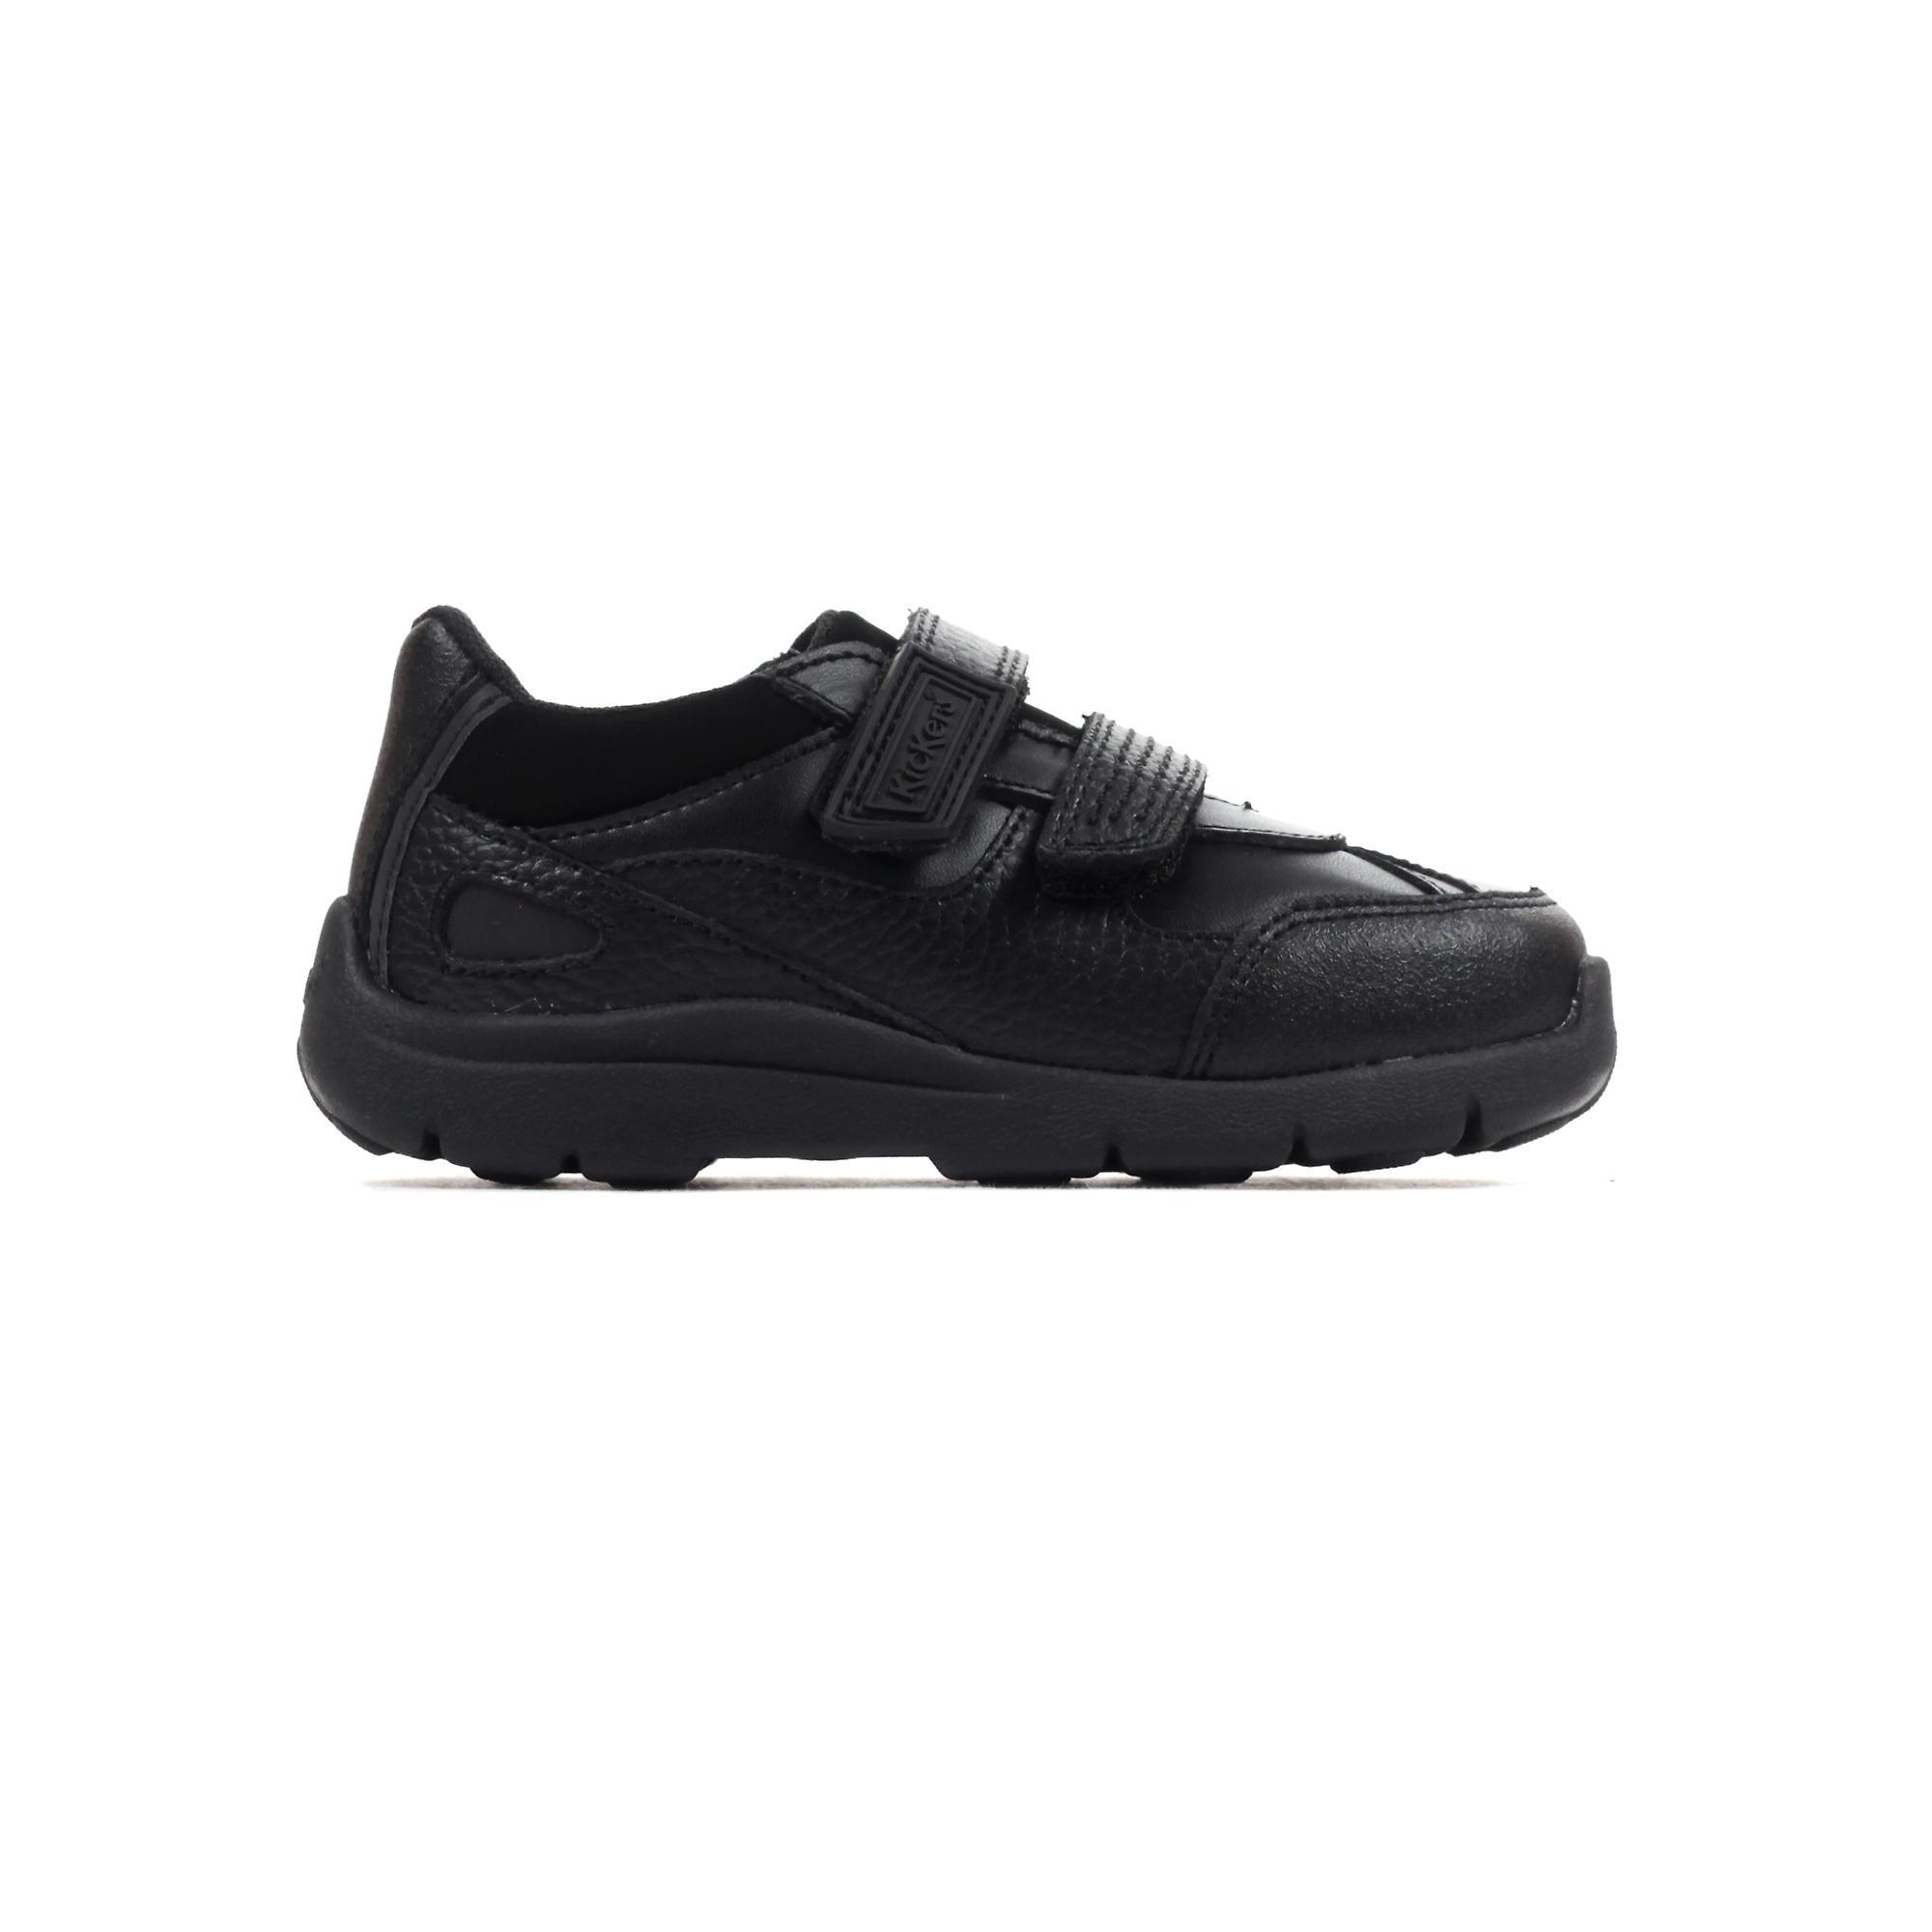 Kickers Moakie Reflex Leather Infant Toddler Boys School Fashion Shoe Black